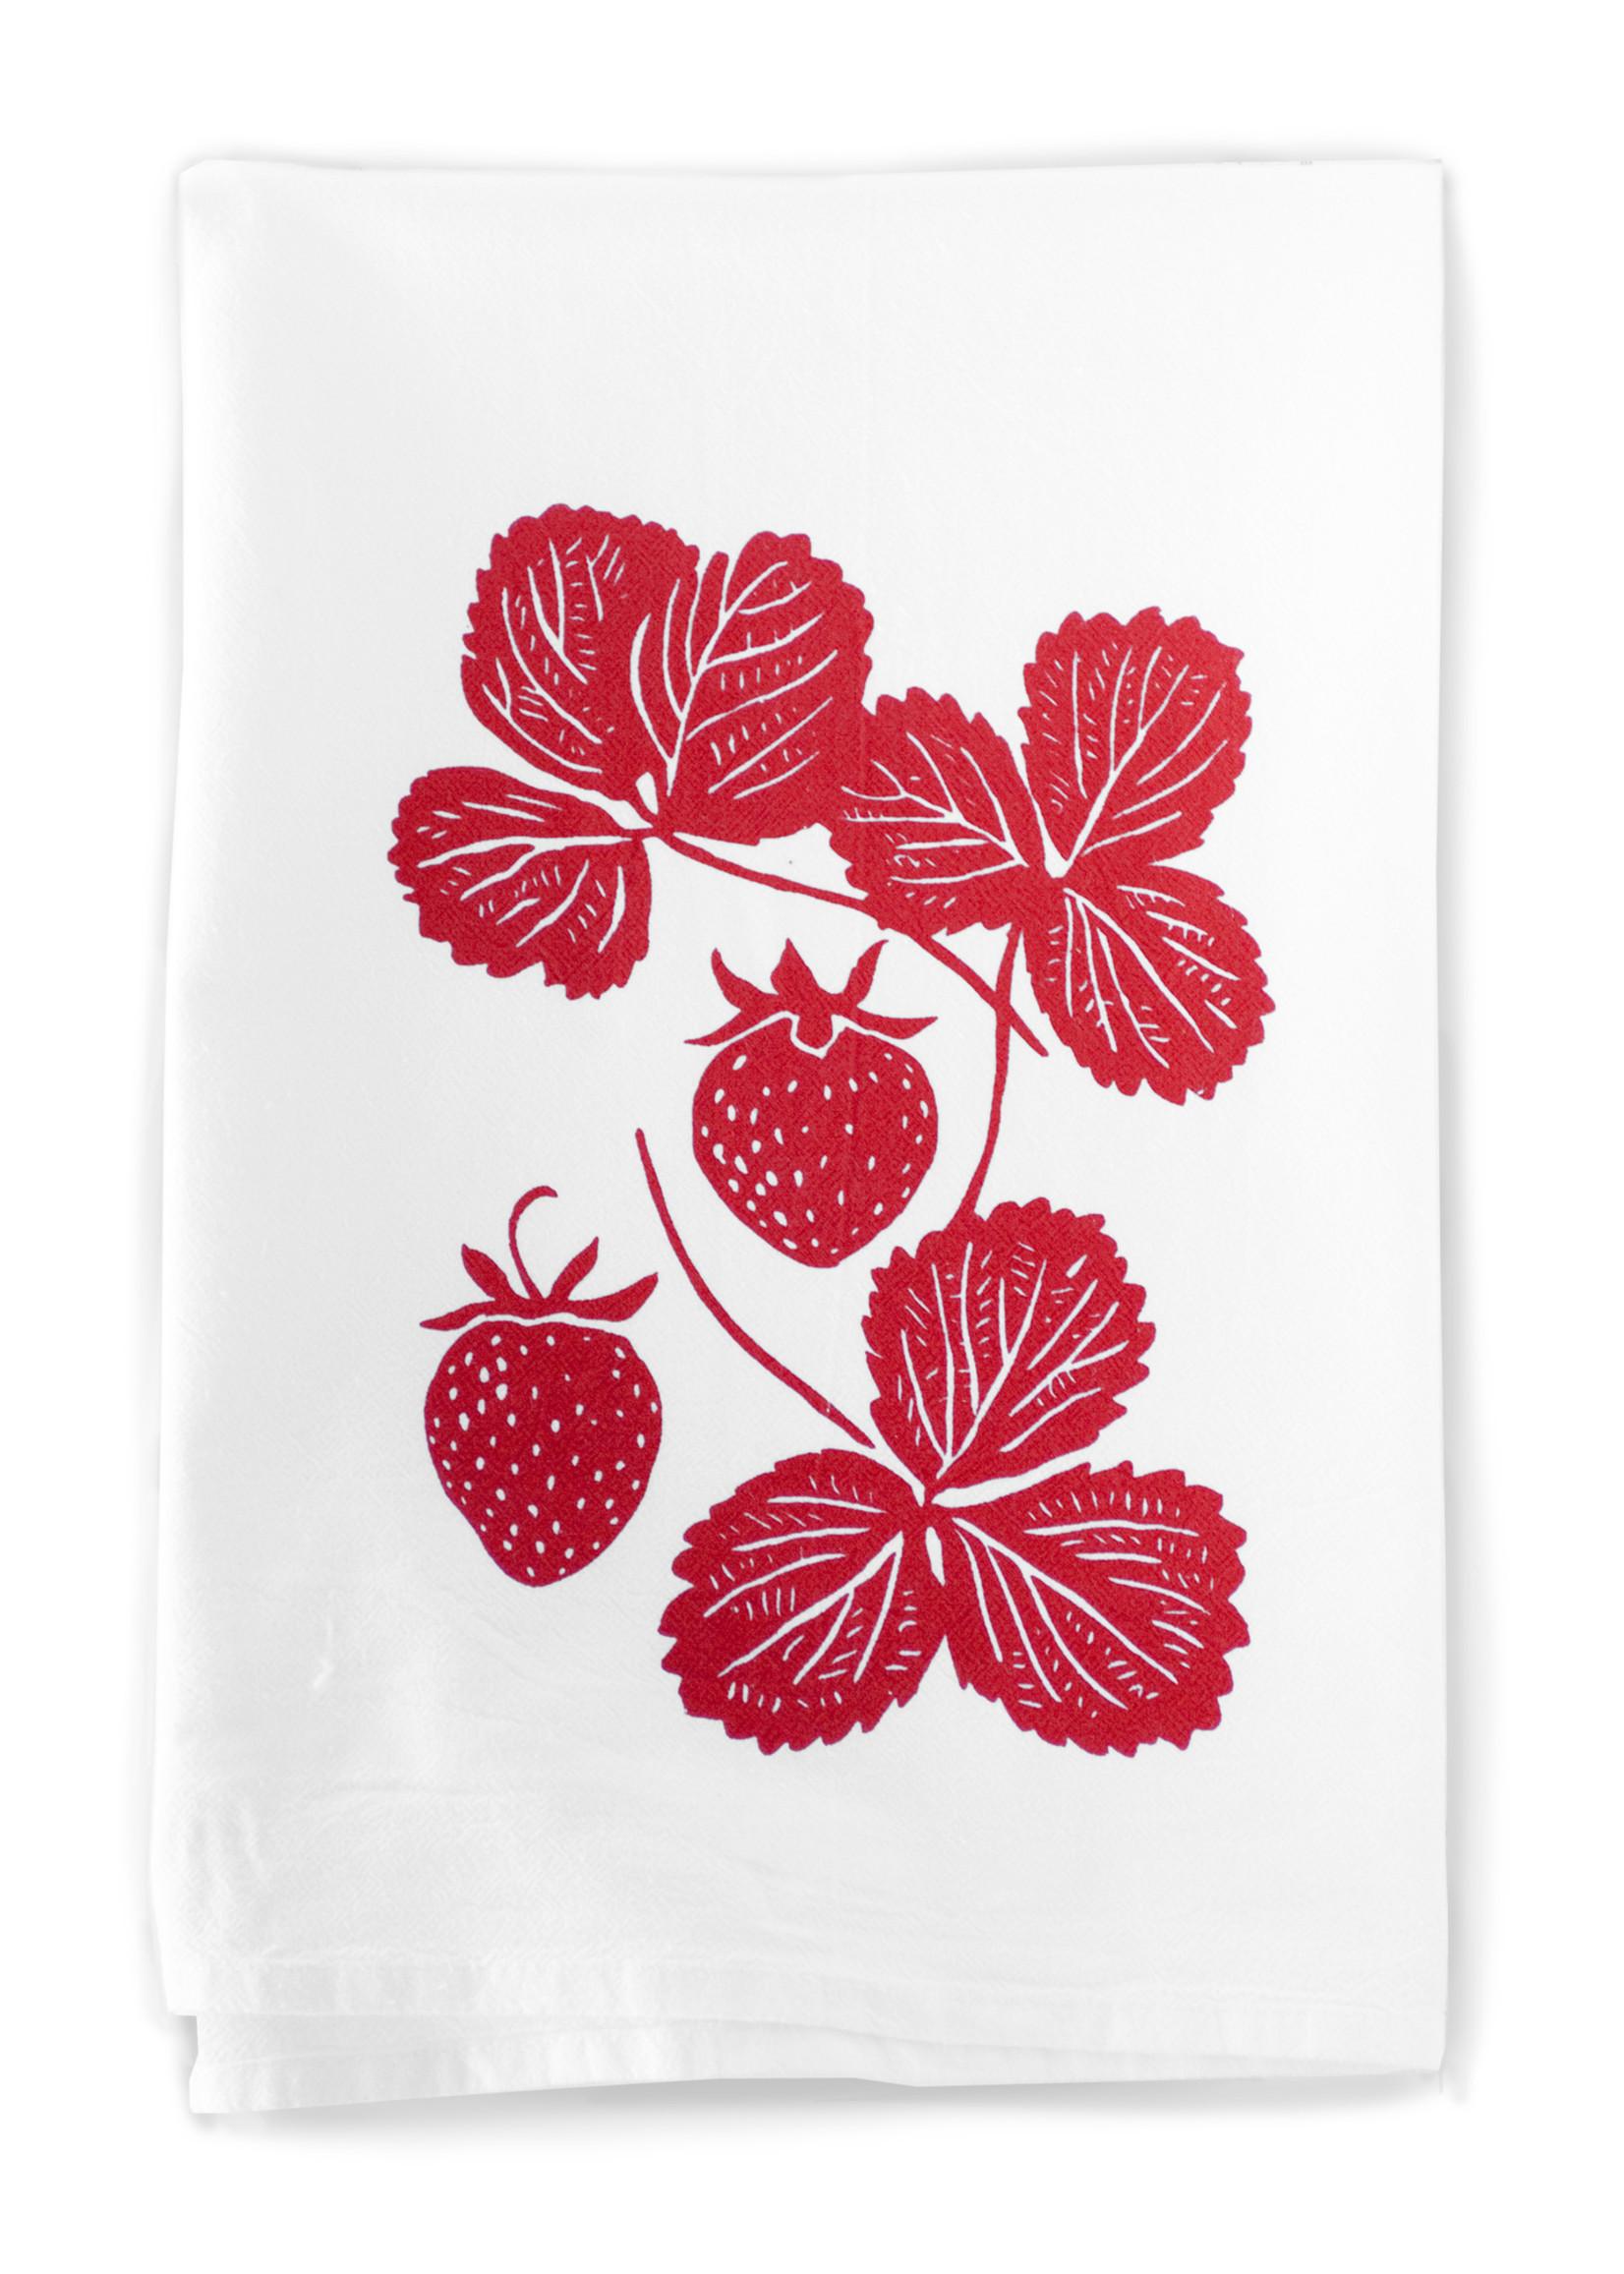 Rigel Stuhmiller Kitchen Towel - Strawberry